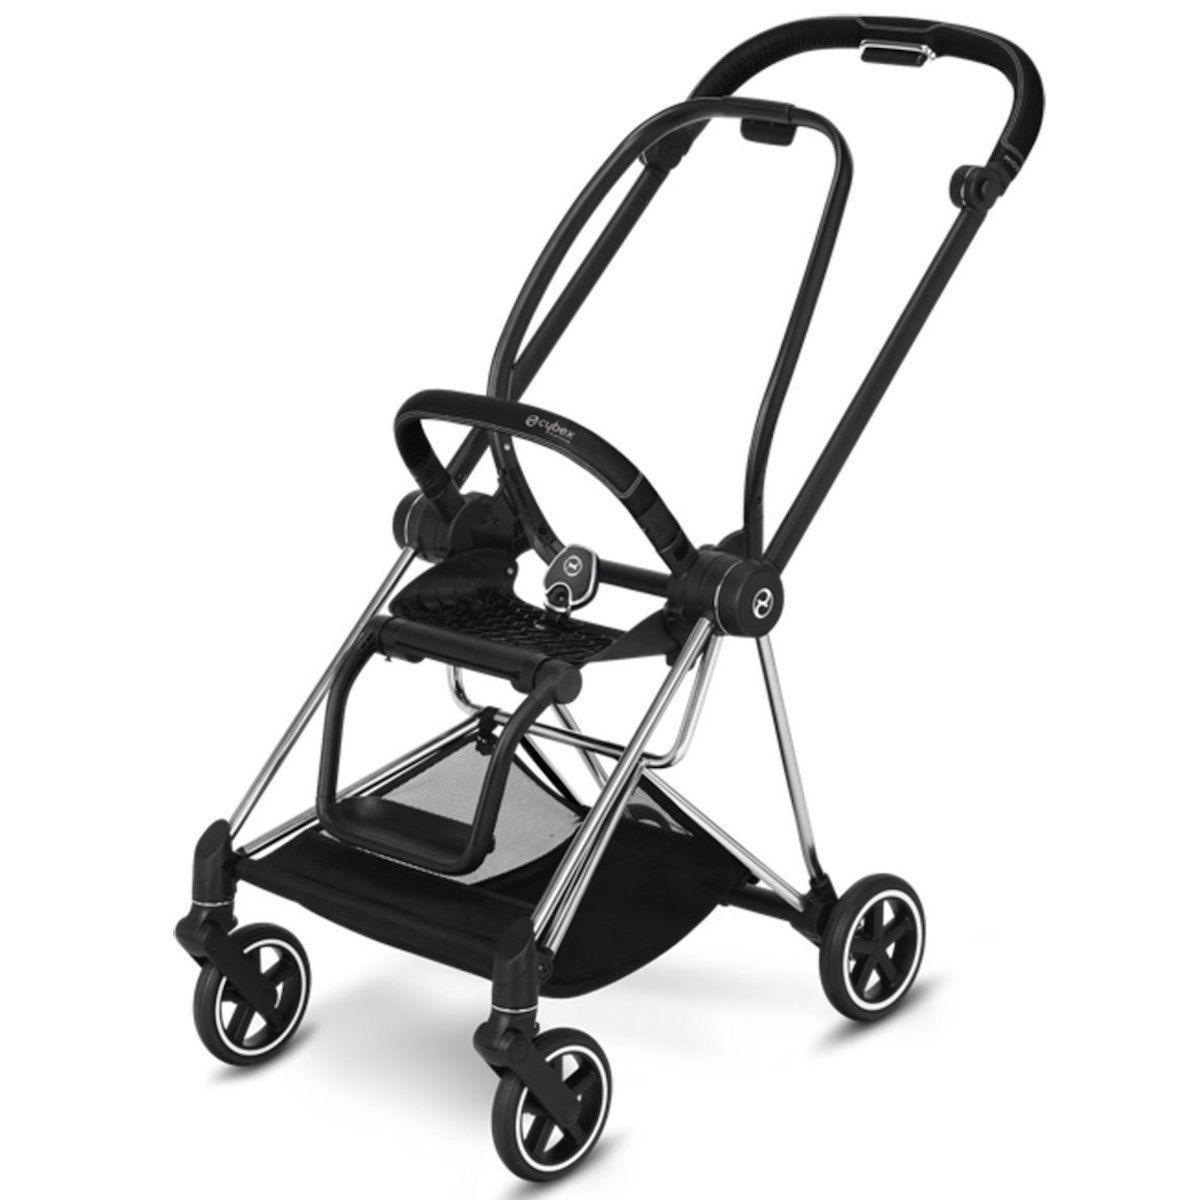 Chasis carrito MIOS Cybex chrome-black